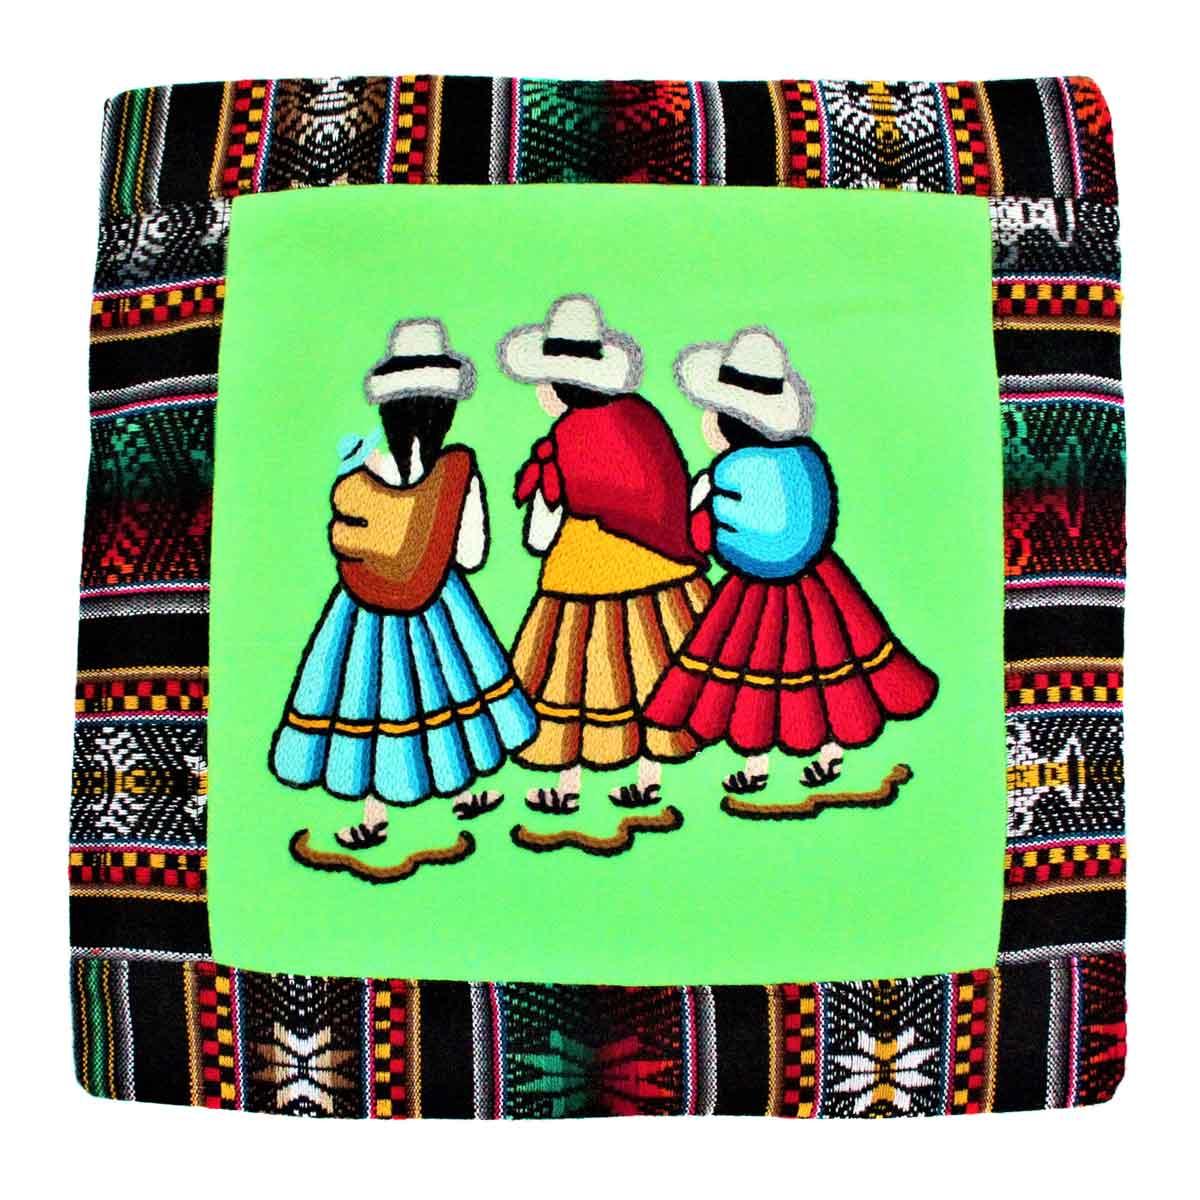 Inka-Products-Housse Coussin Péruvienne-Verte Las Chismosas